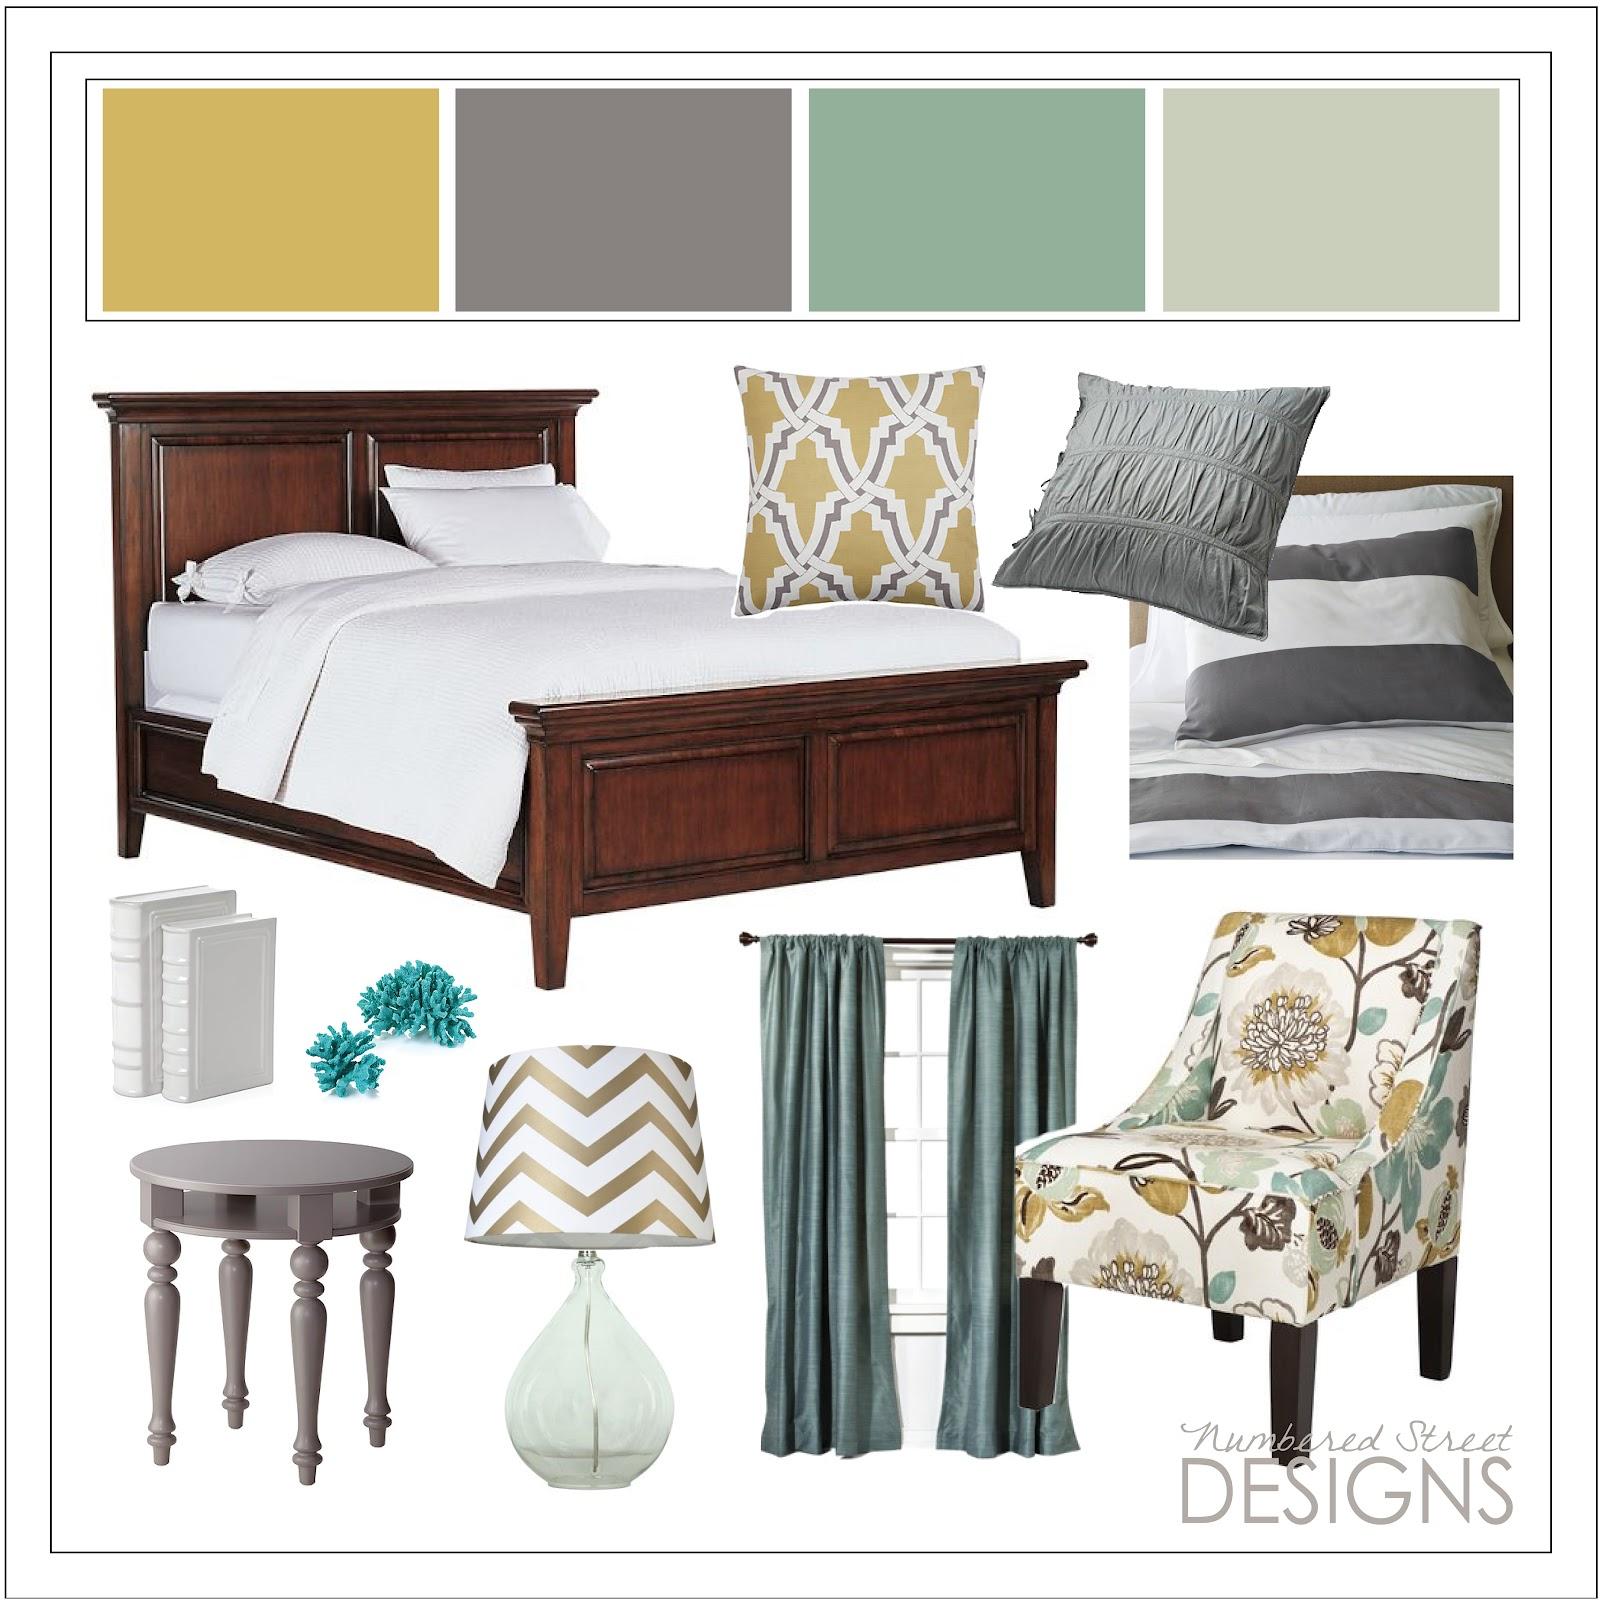 My Bedroom: Numbered Street Designs: My Dream Bedroom